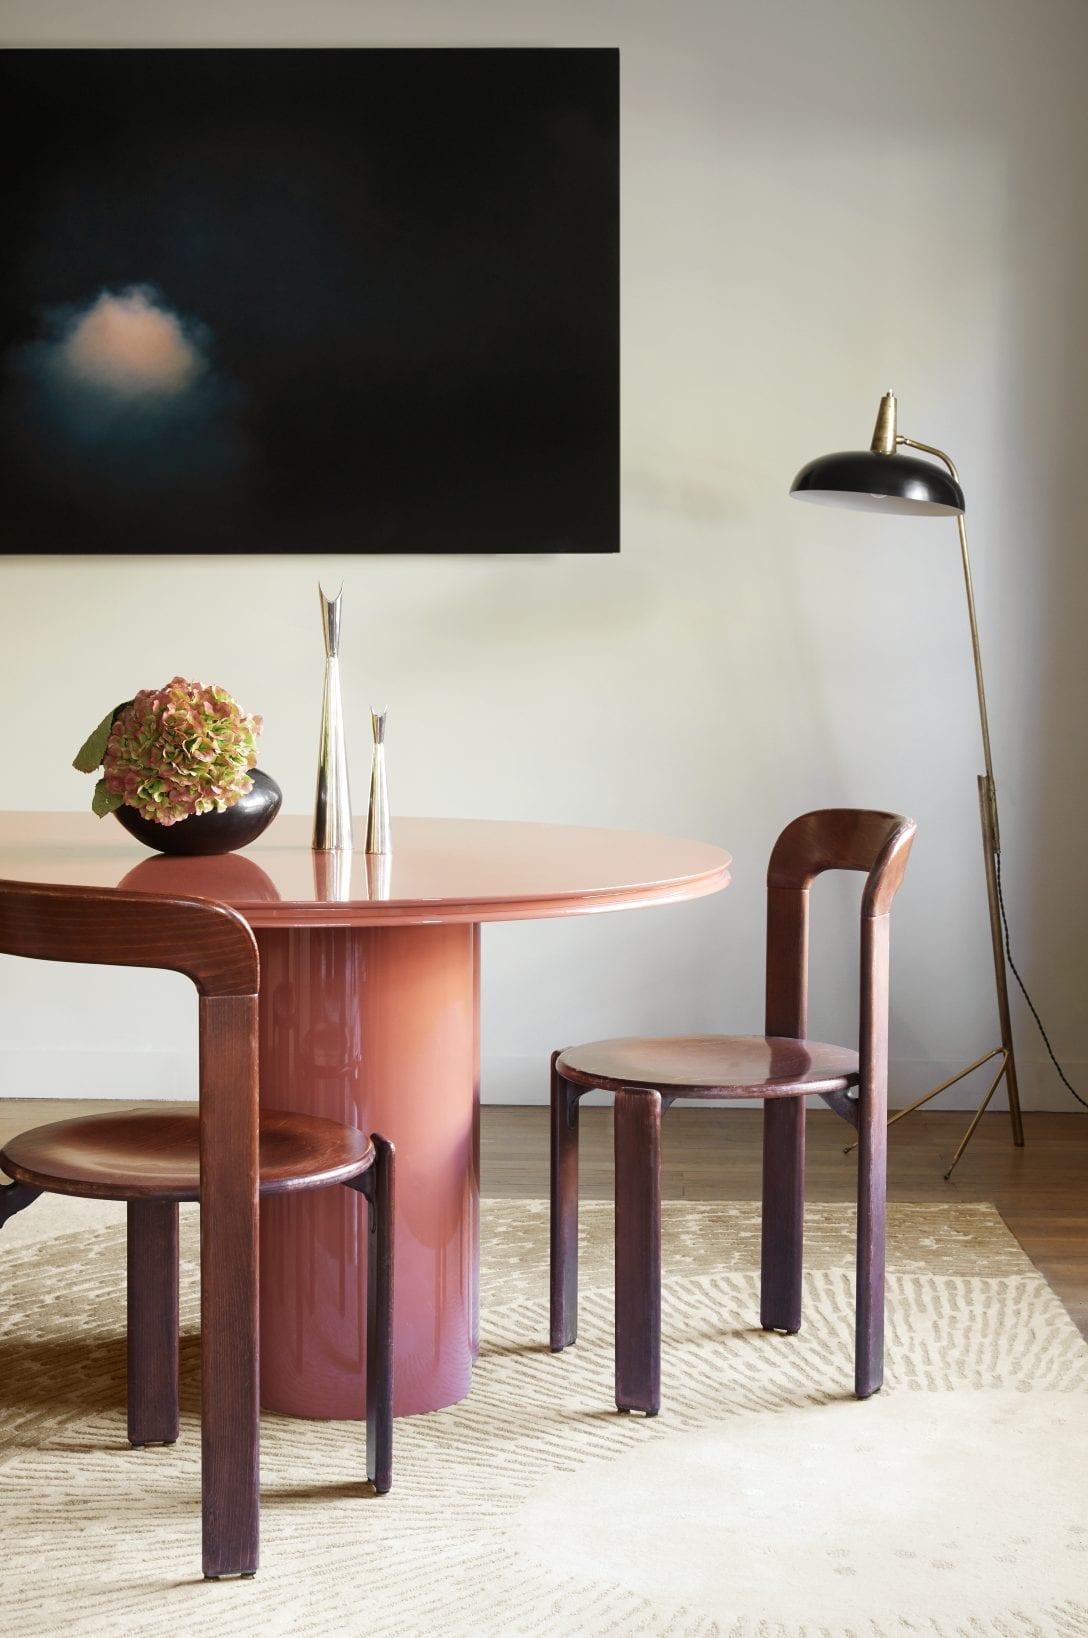 The Invisible Collection Studio Parisien - Paris Montparnasse 2021 Shooting